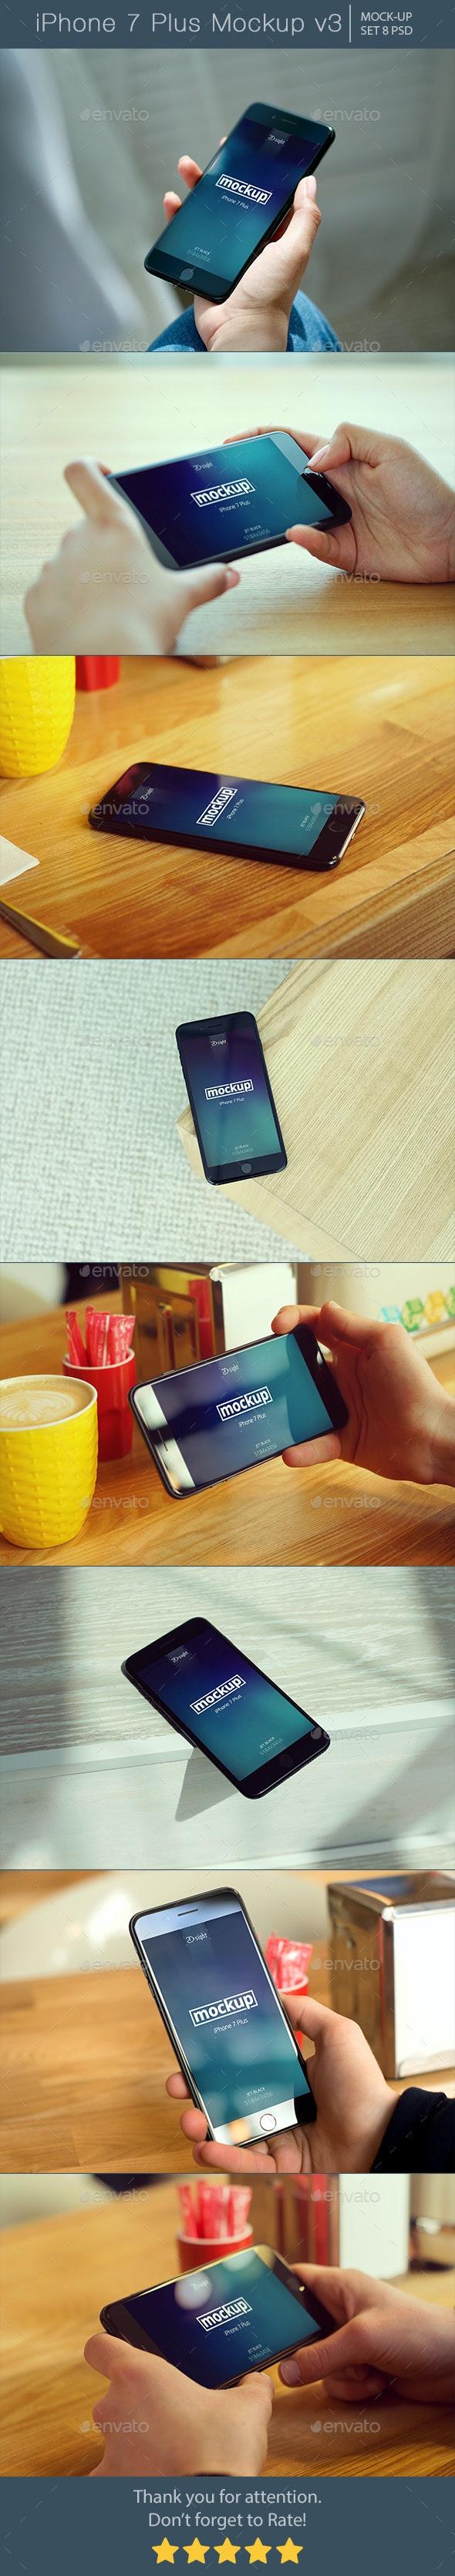 iPhone 7 Plus Mockup v3 - Mobile Displays